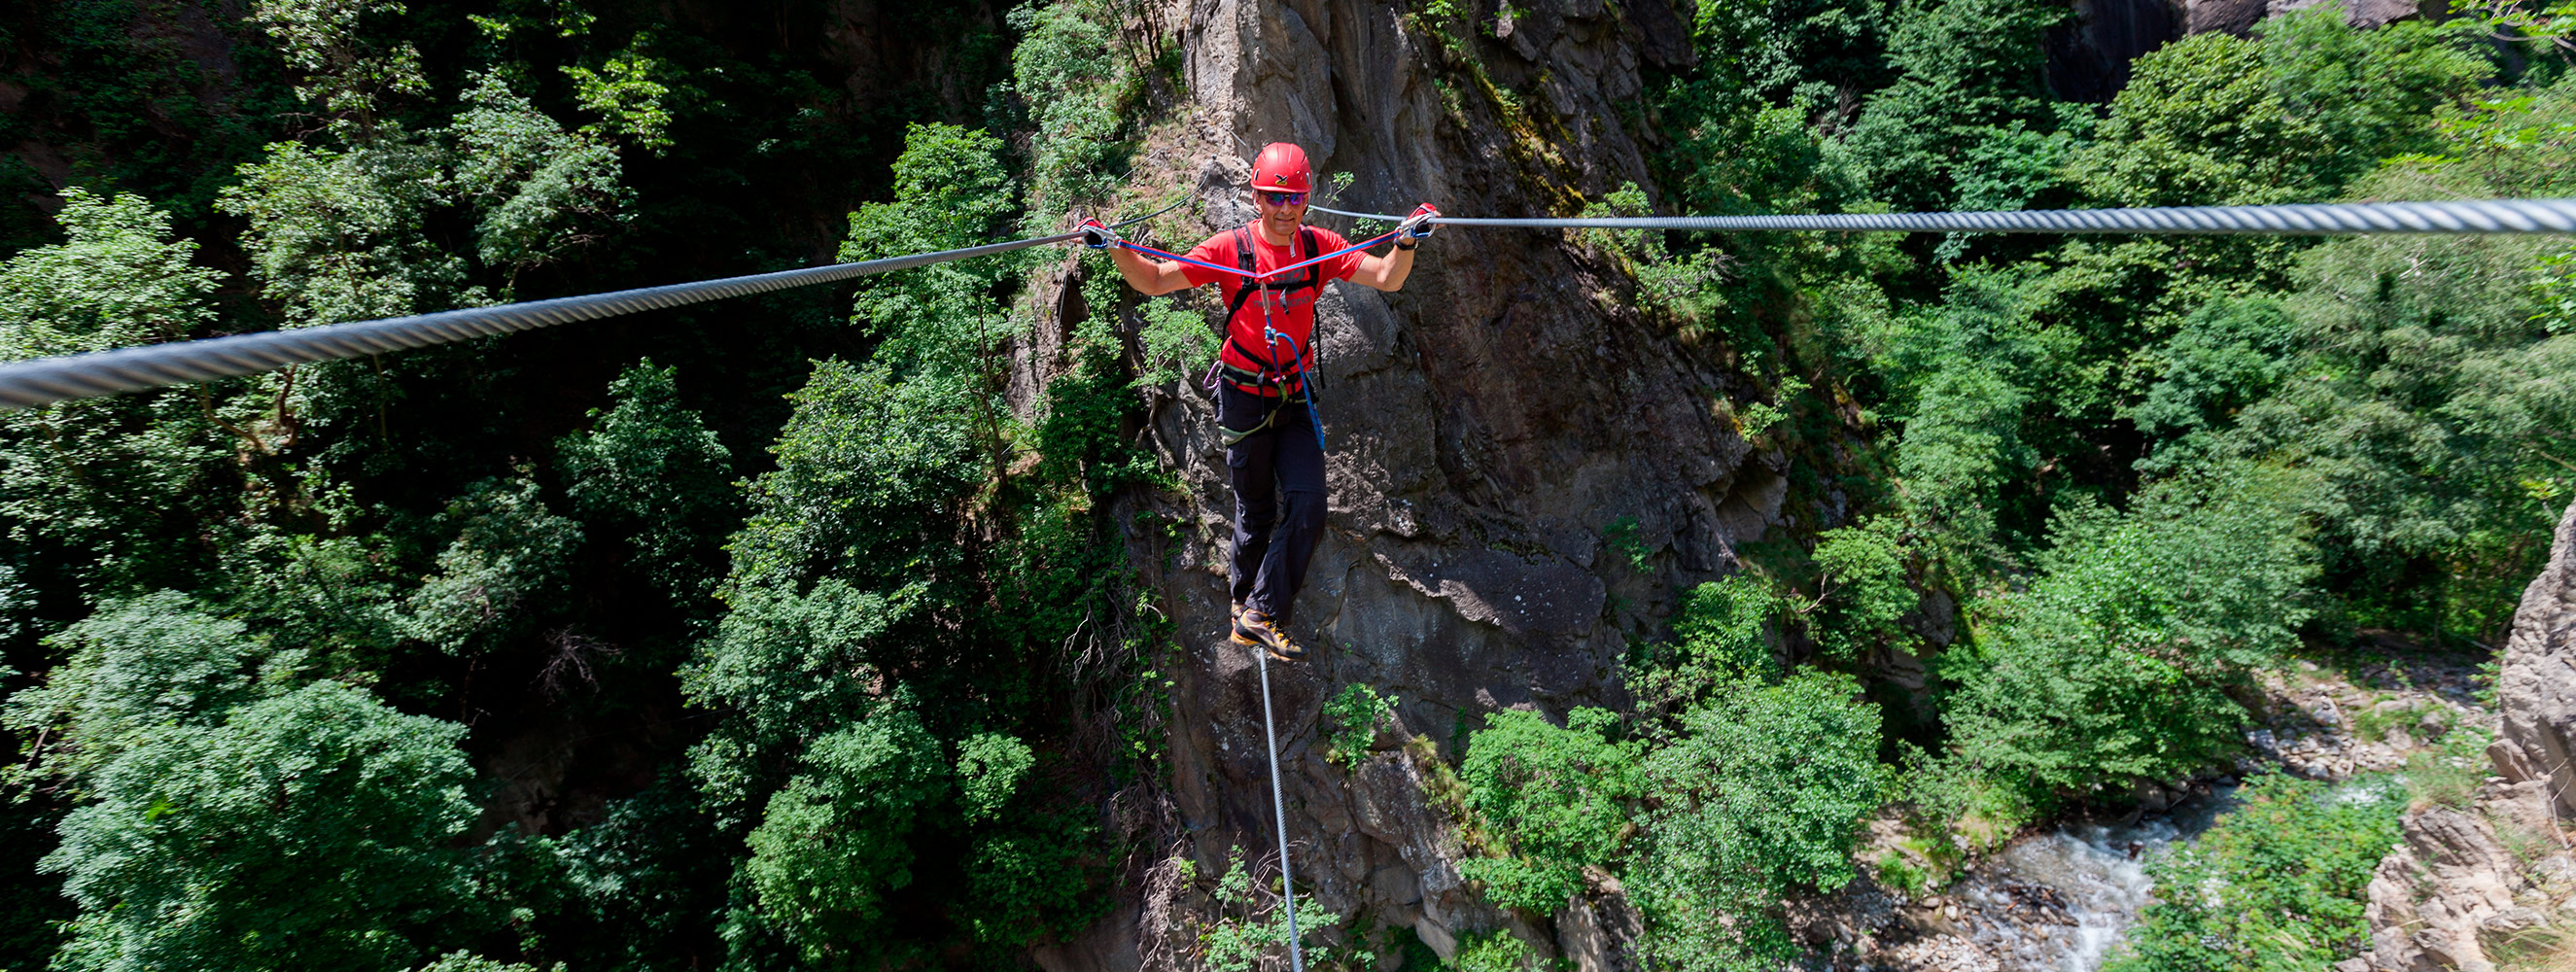 Attivo in estate - Residence Etschgrund Naturno in Alto Adige